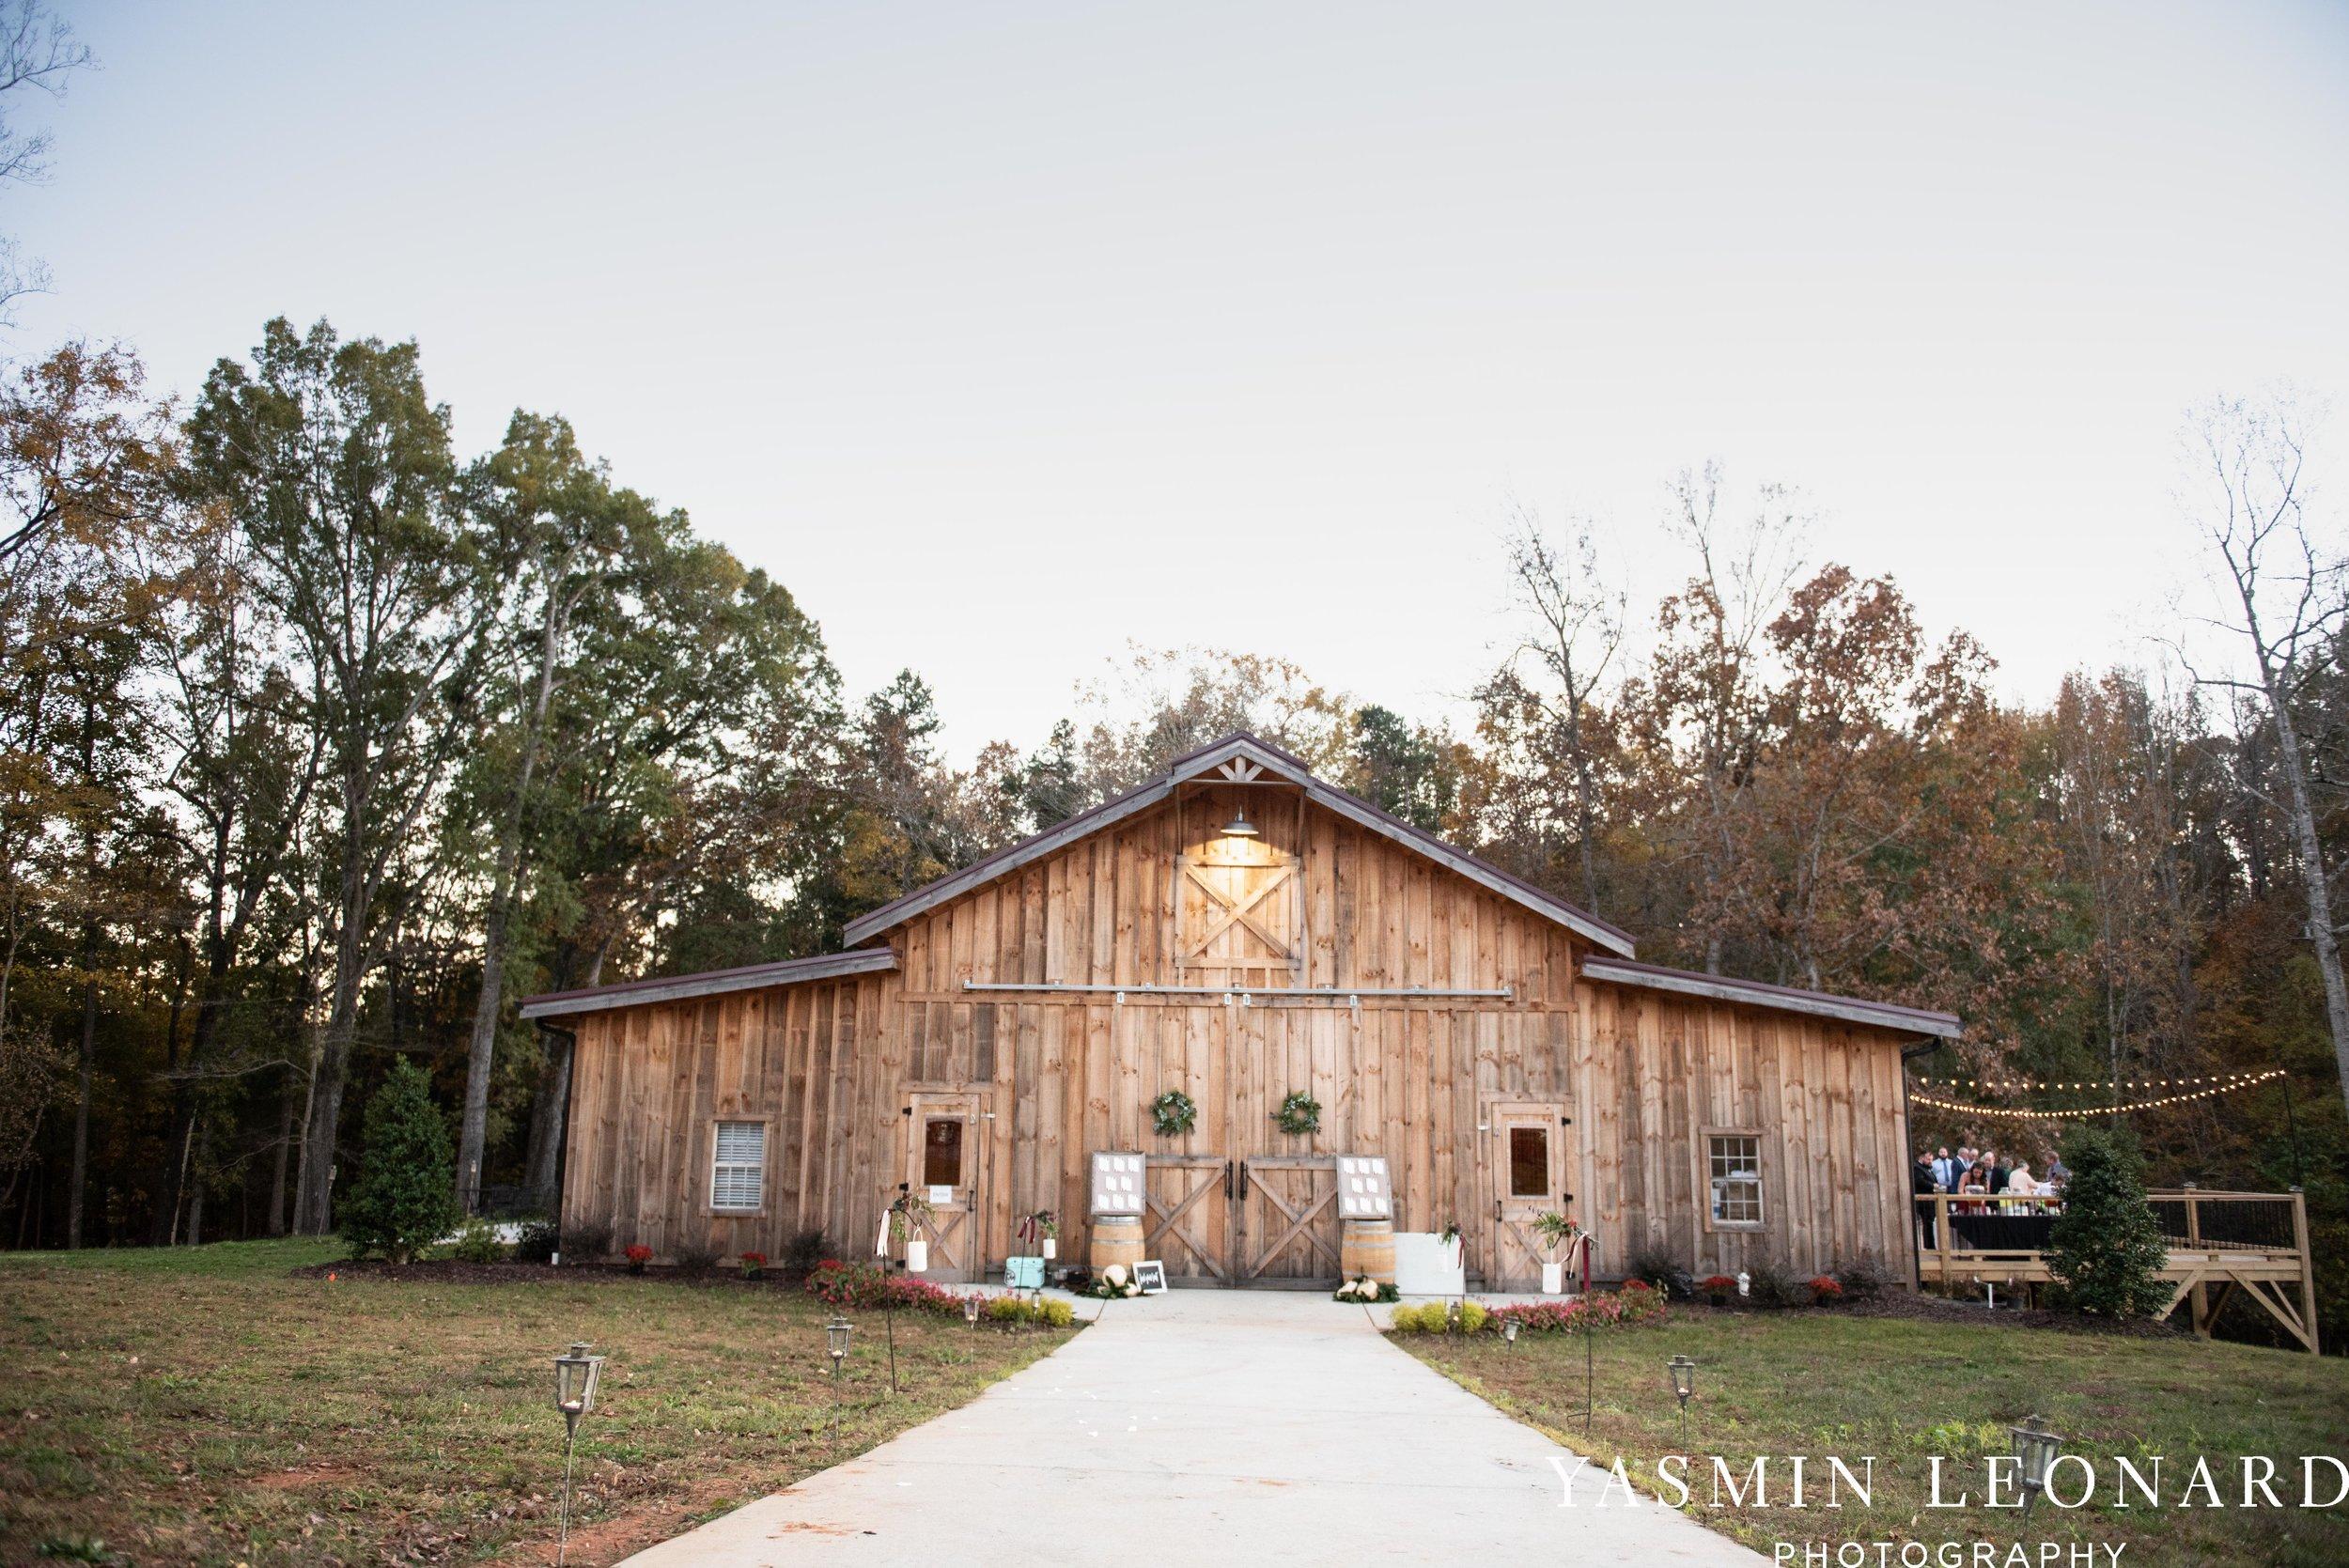 Wesley Memorial United Methodist Church - Old Homeplace Winery - High Point Weddings - High Point Wedding Photographer - NC Weddings - NC Barn Venue - Yasmin Leonard Photography-35.jpg